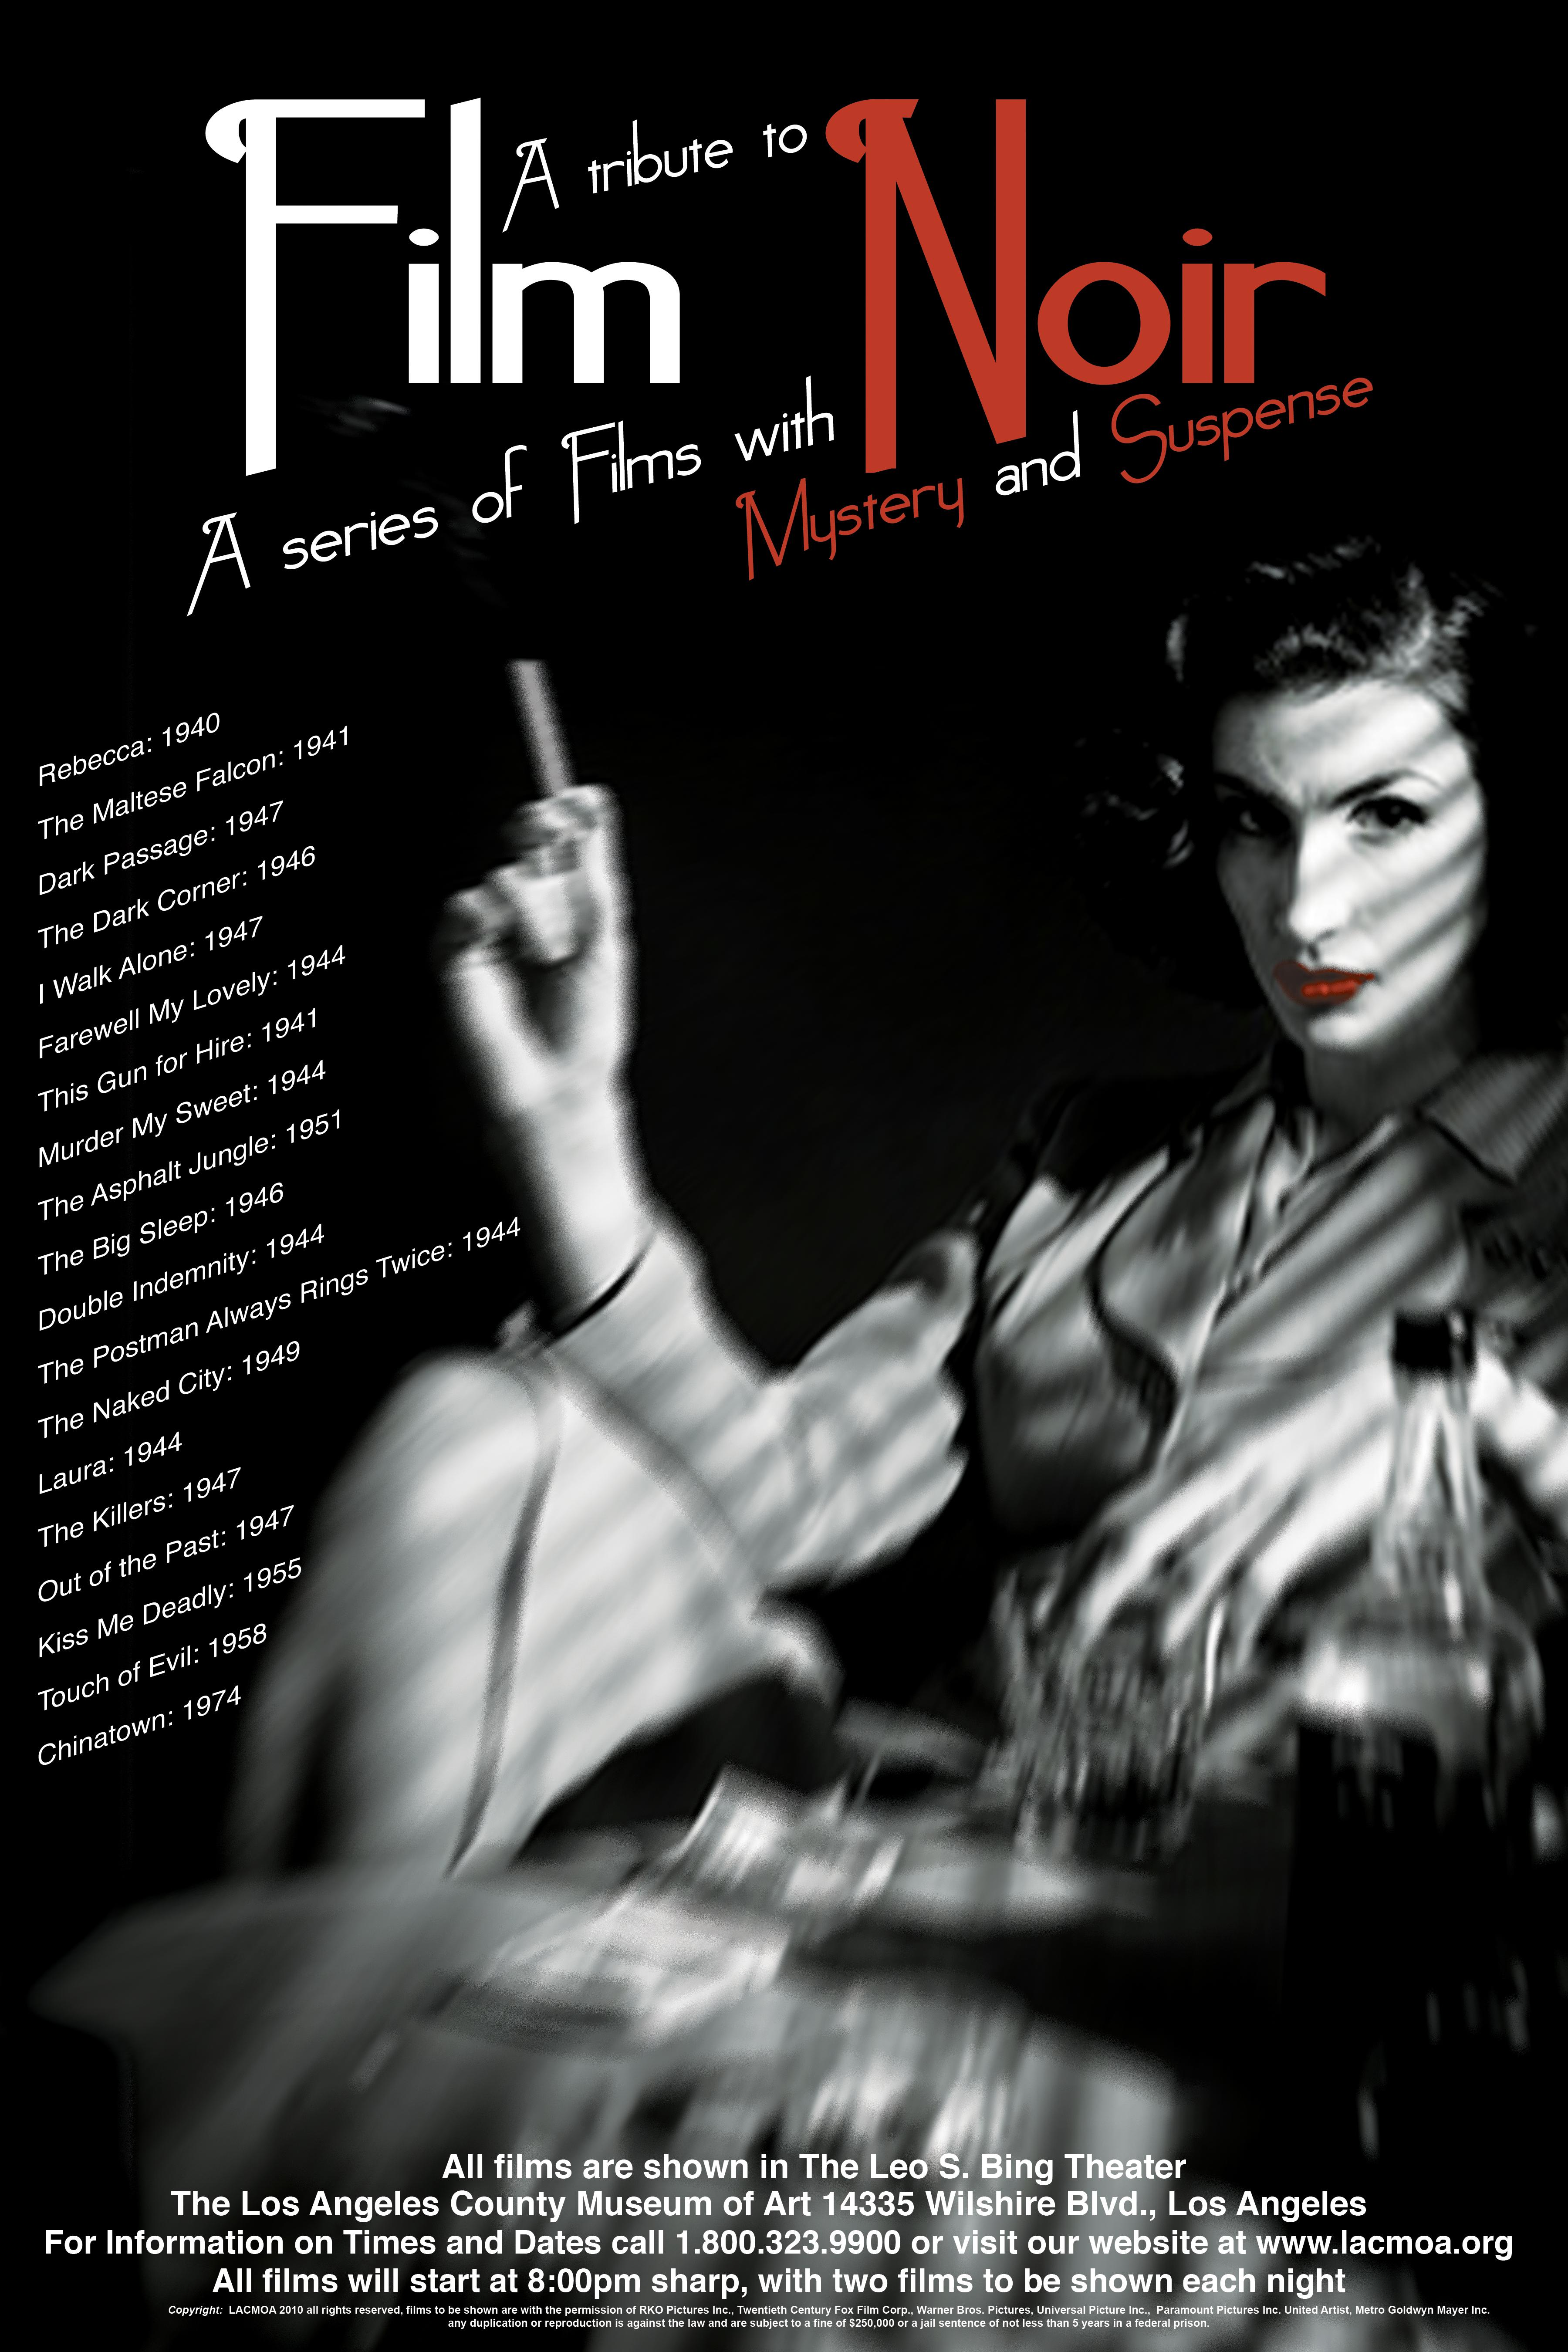 femme fatale film noir femme fatale film noir